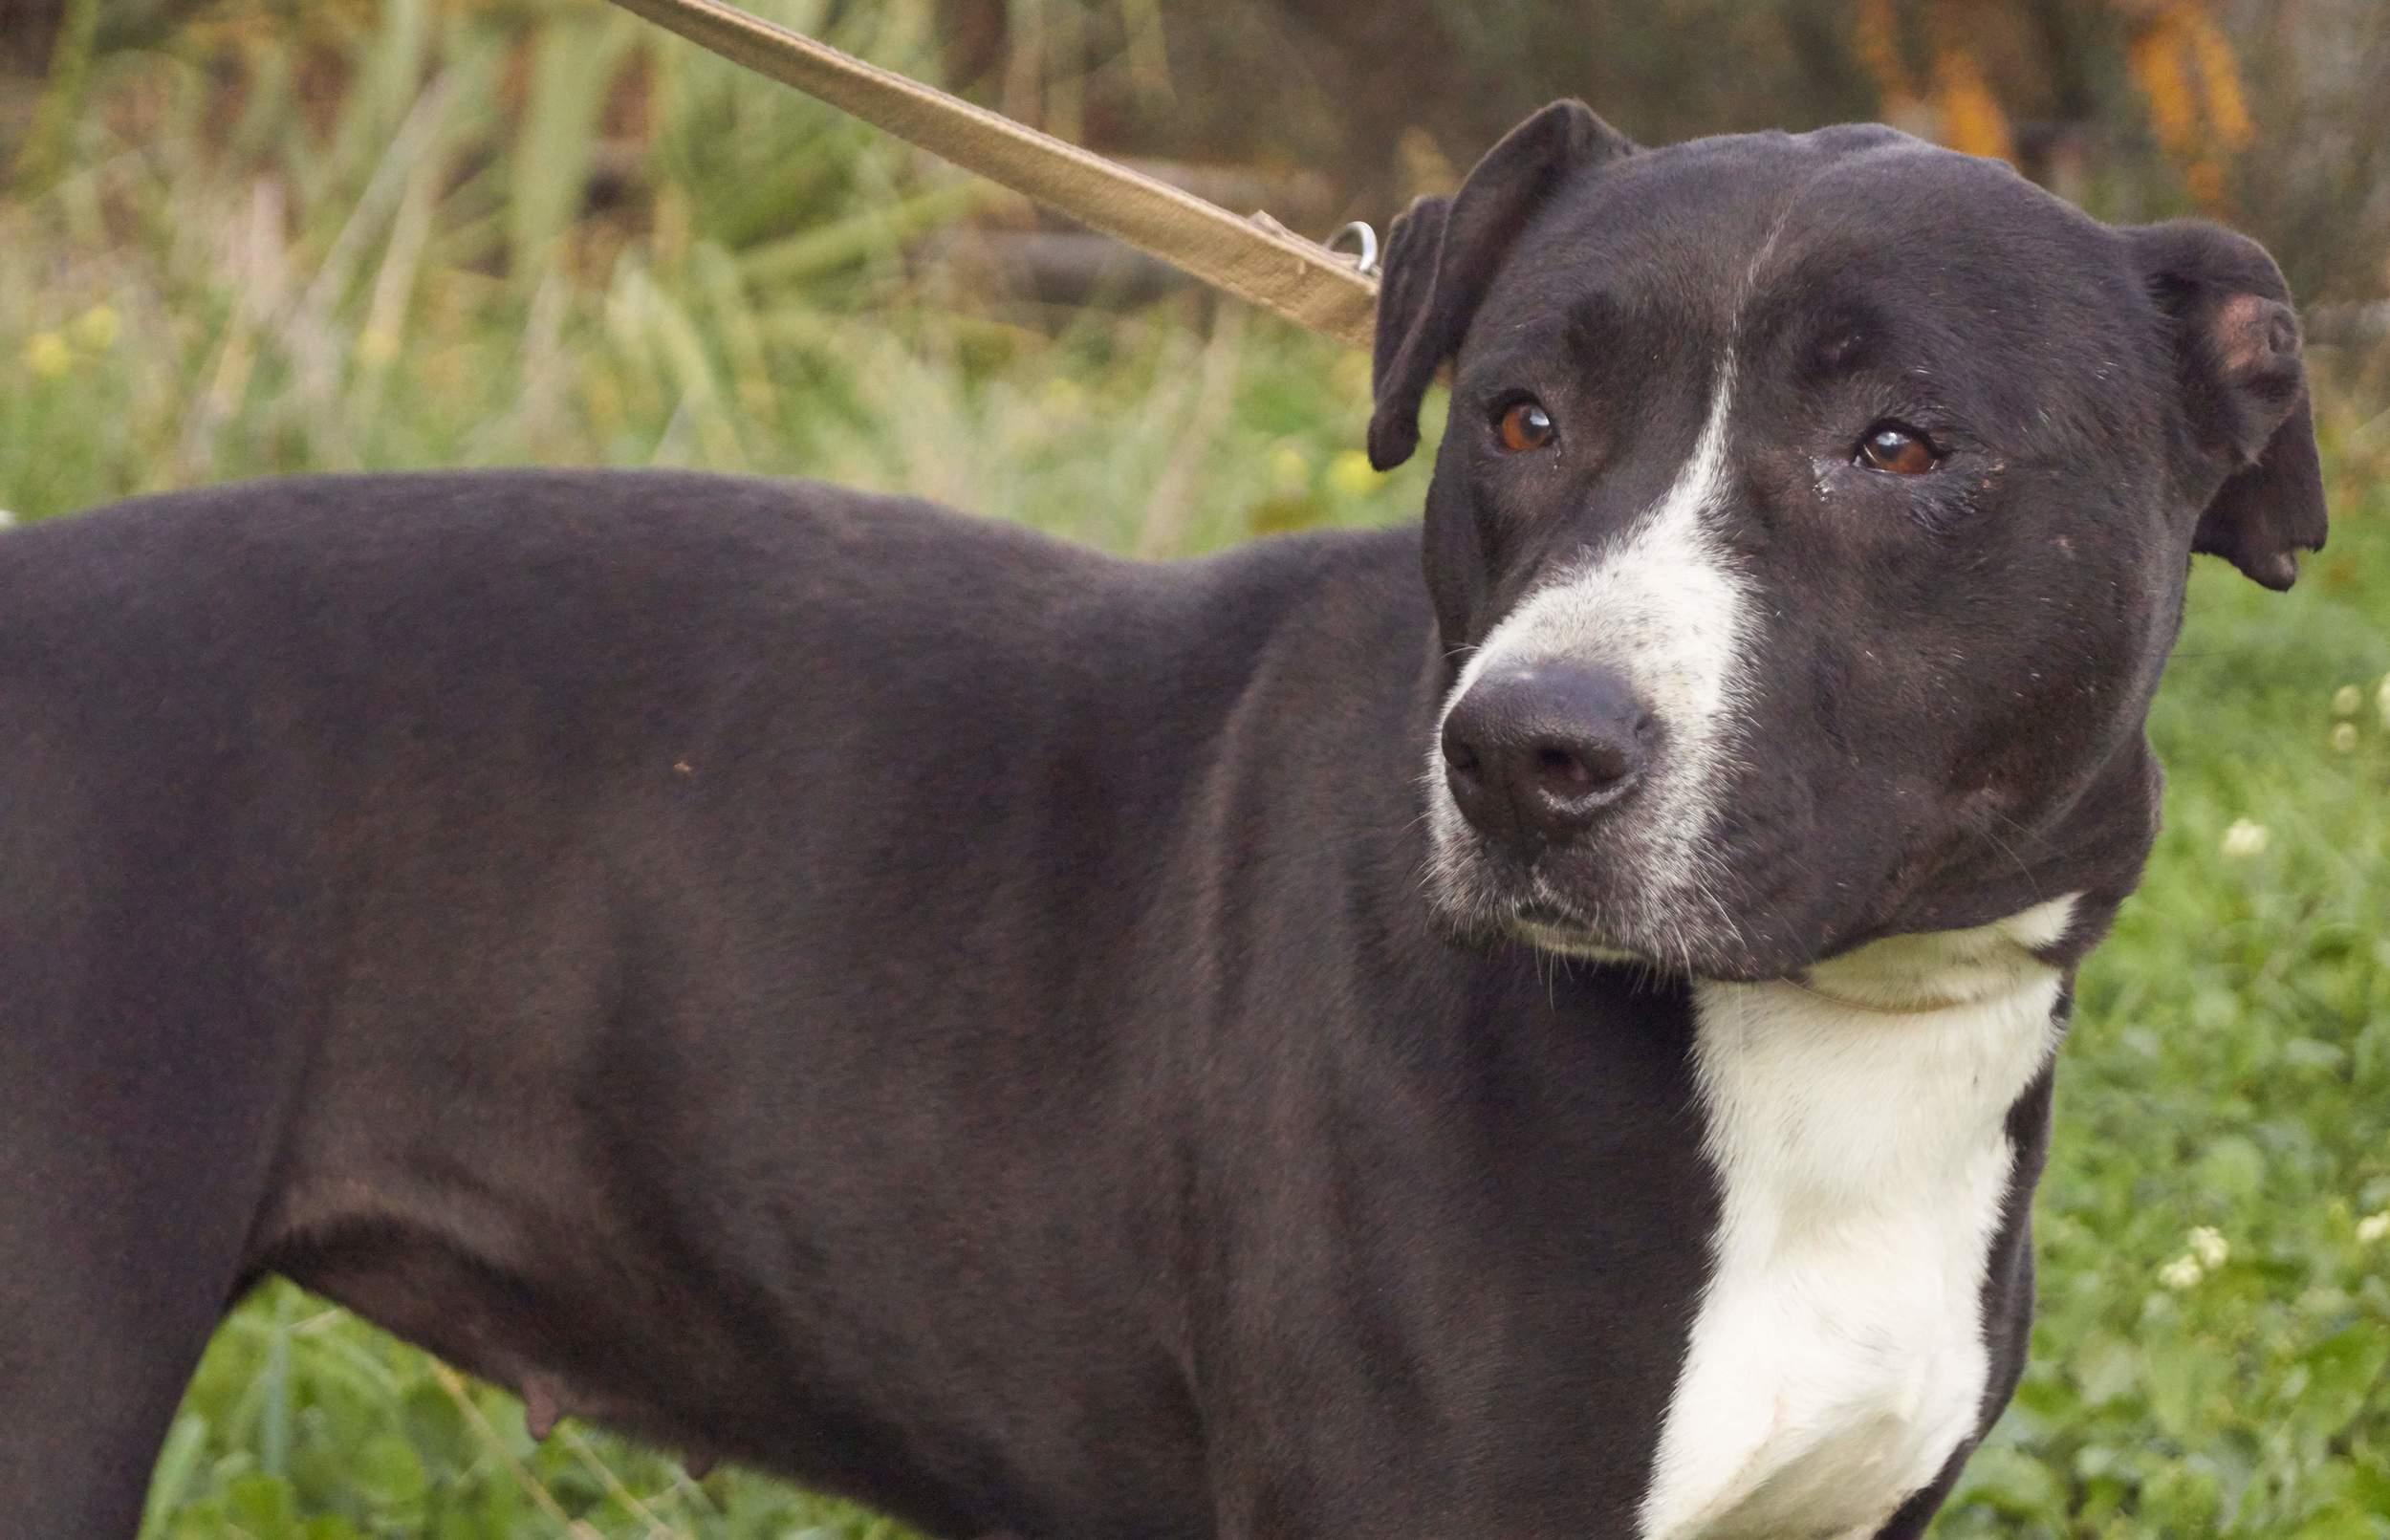 Jazz pitbull mix | Mykonos dog rescue and adoption